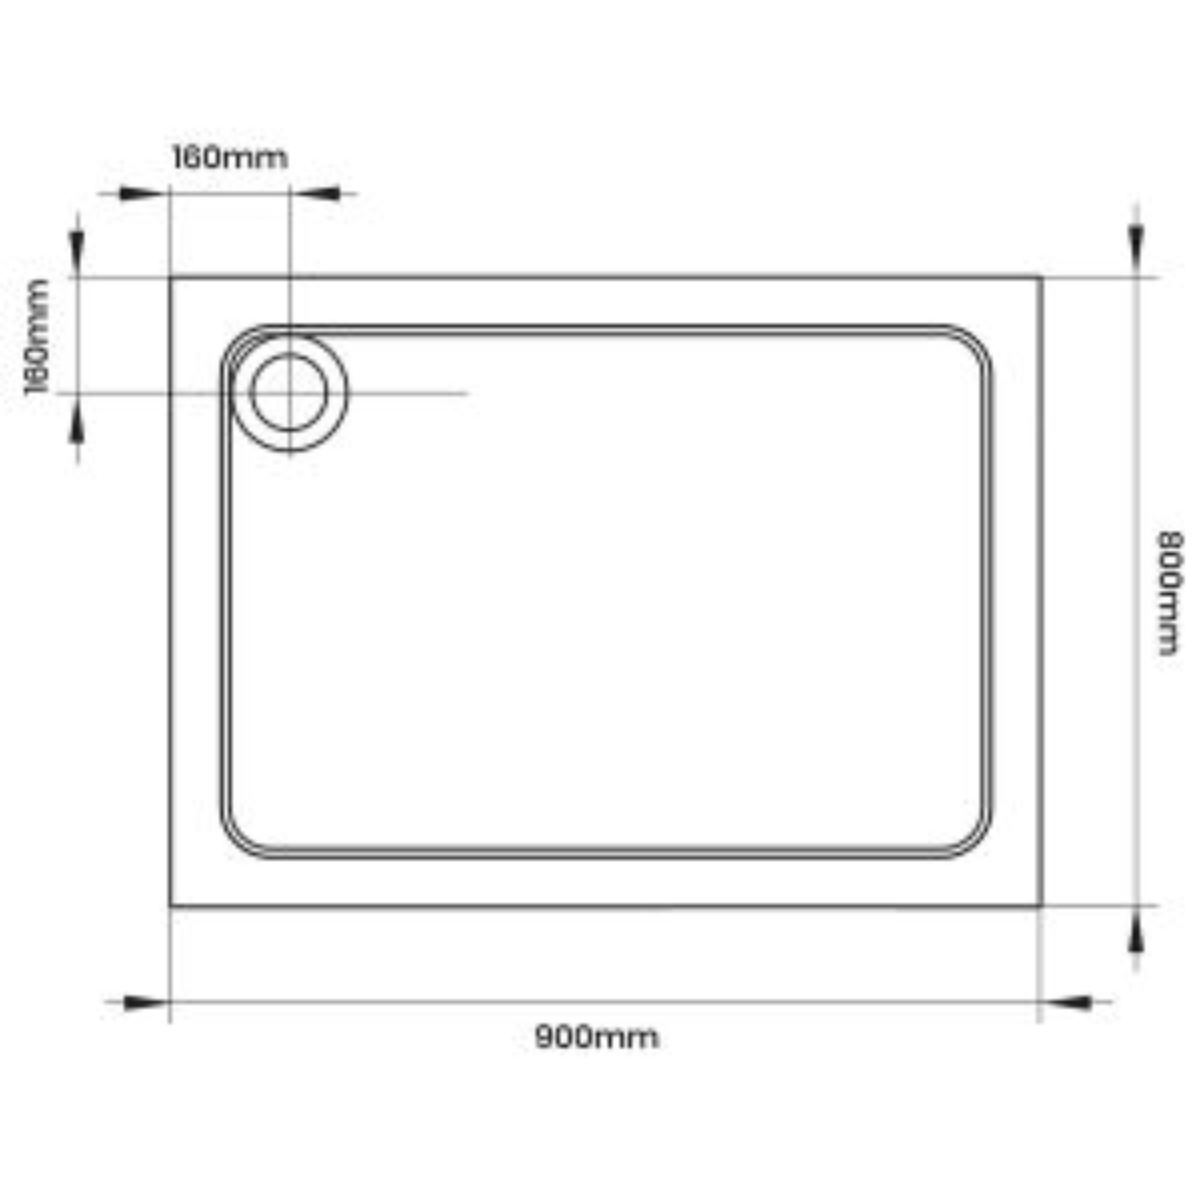 Aquadart Rectangular 900 x 800 Shower Tray